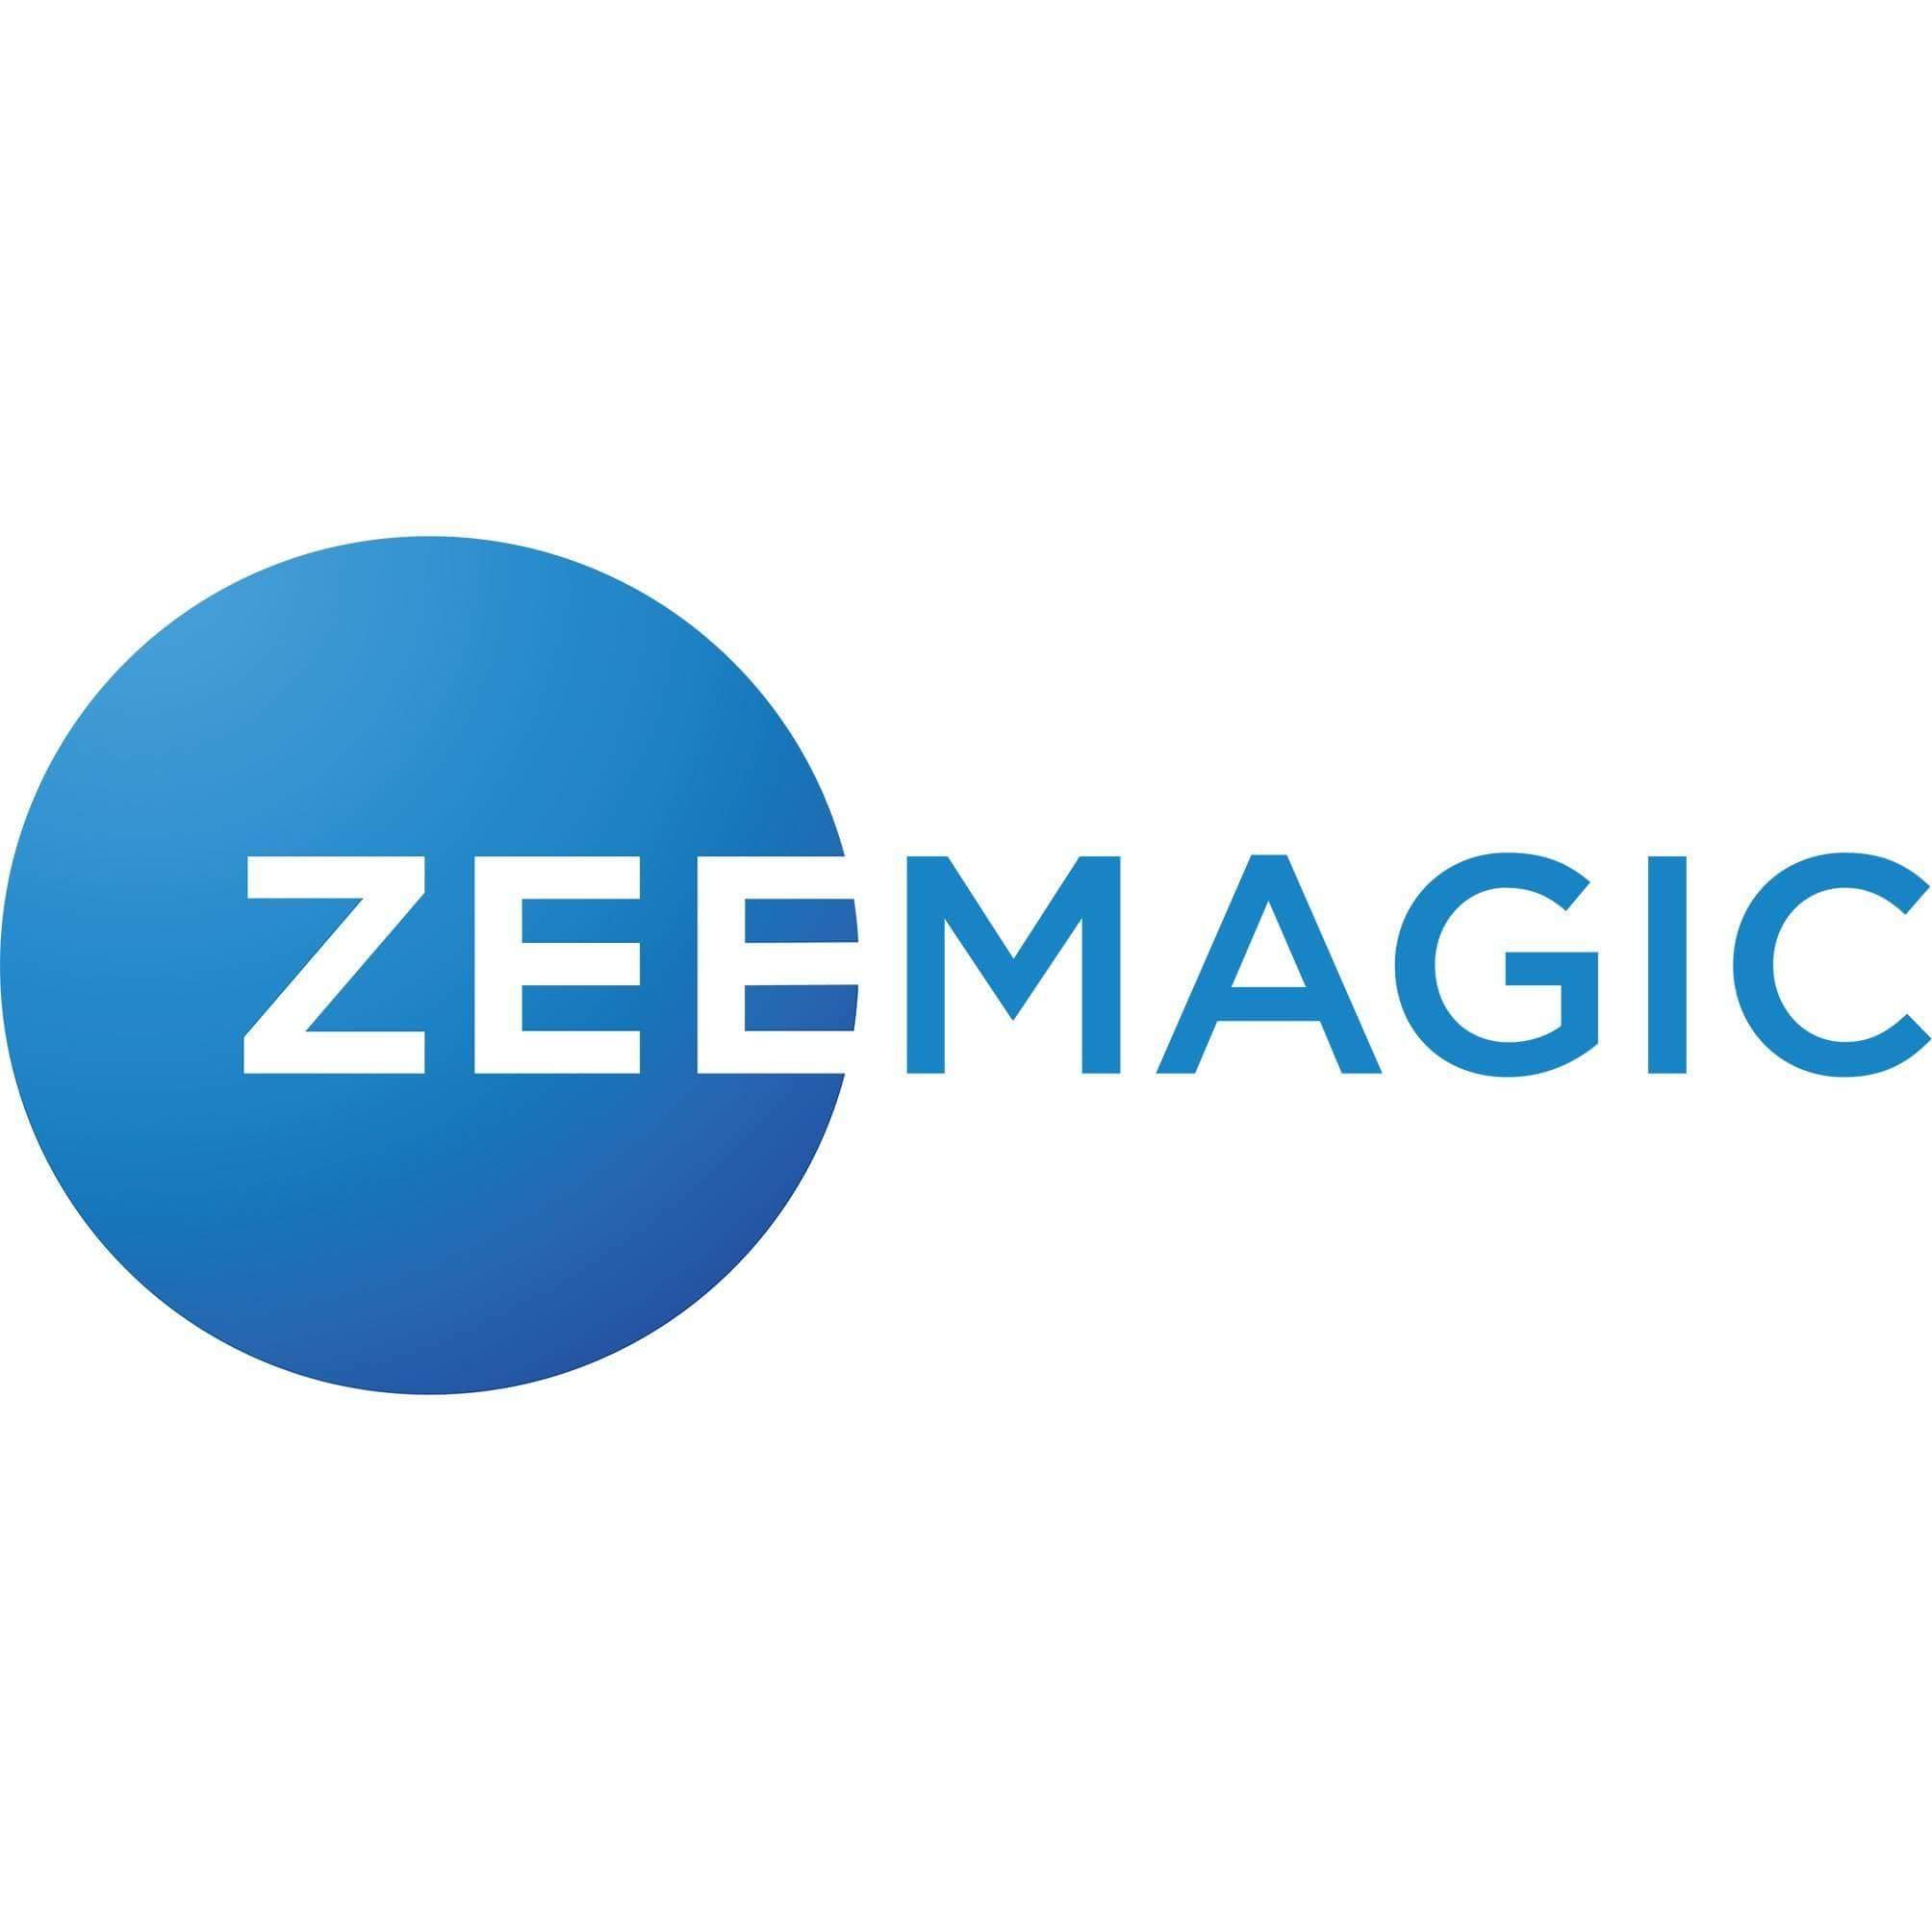 Zee Magic - Wikipedia